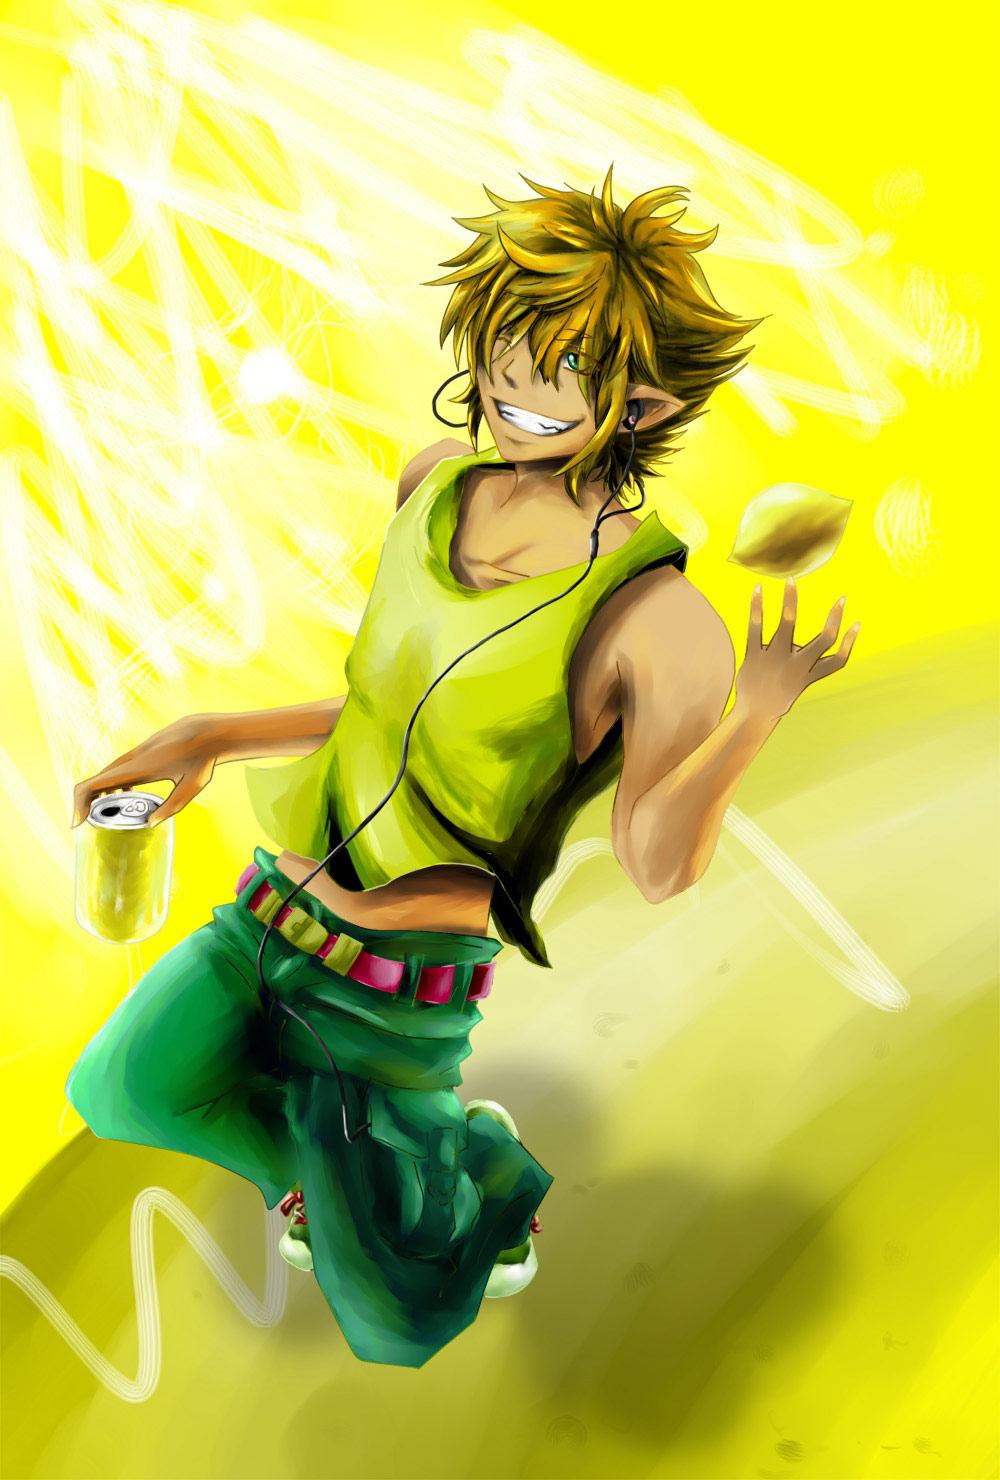 Lemon Link